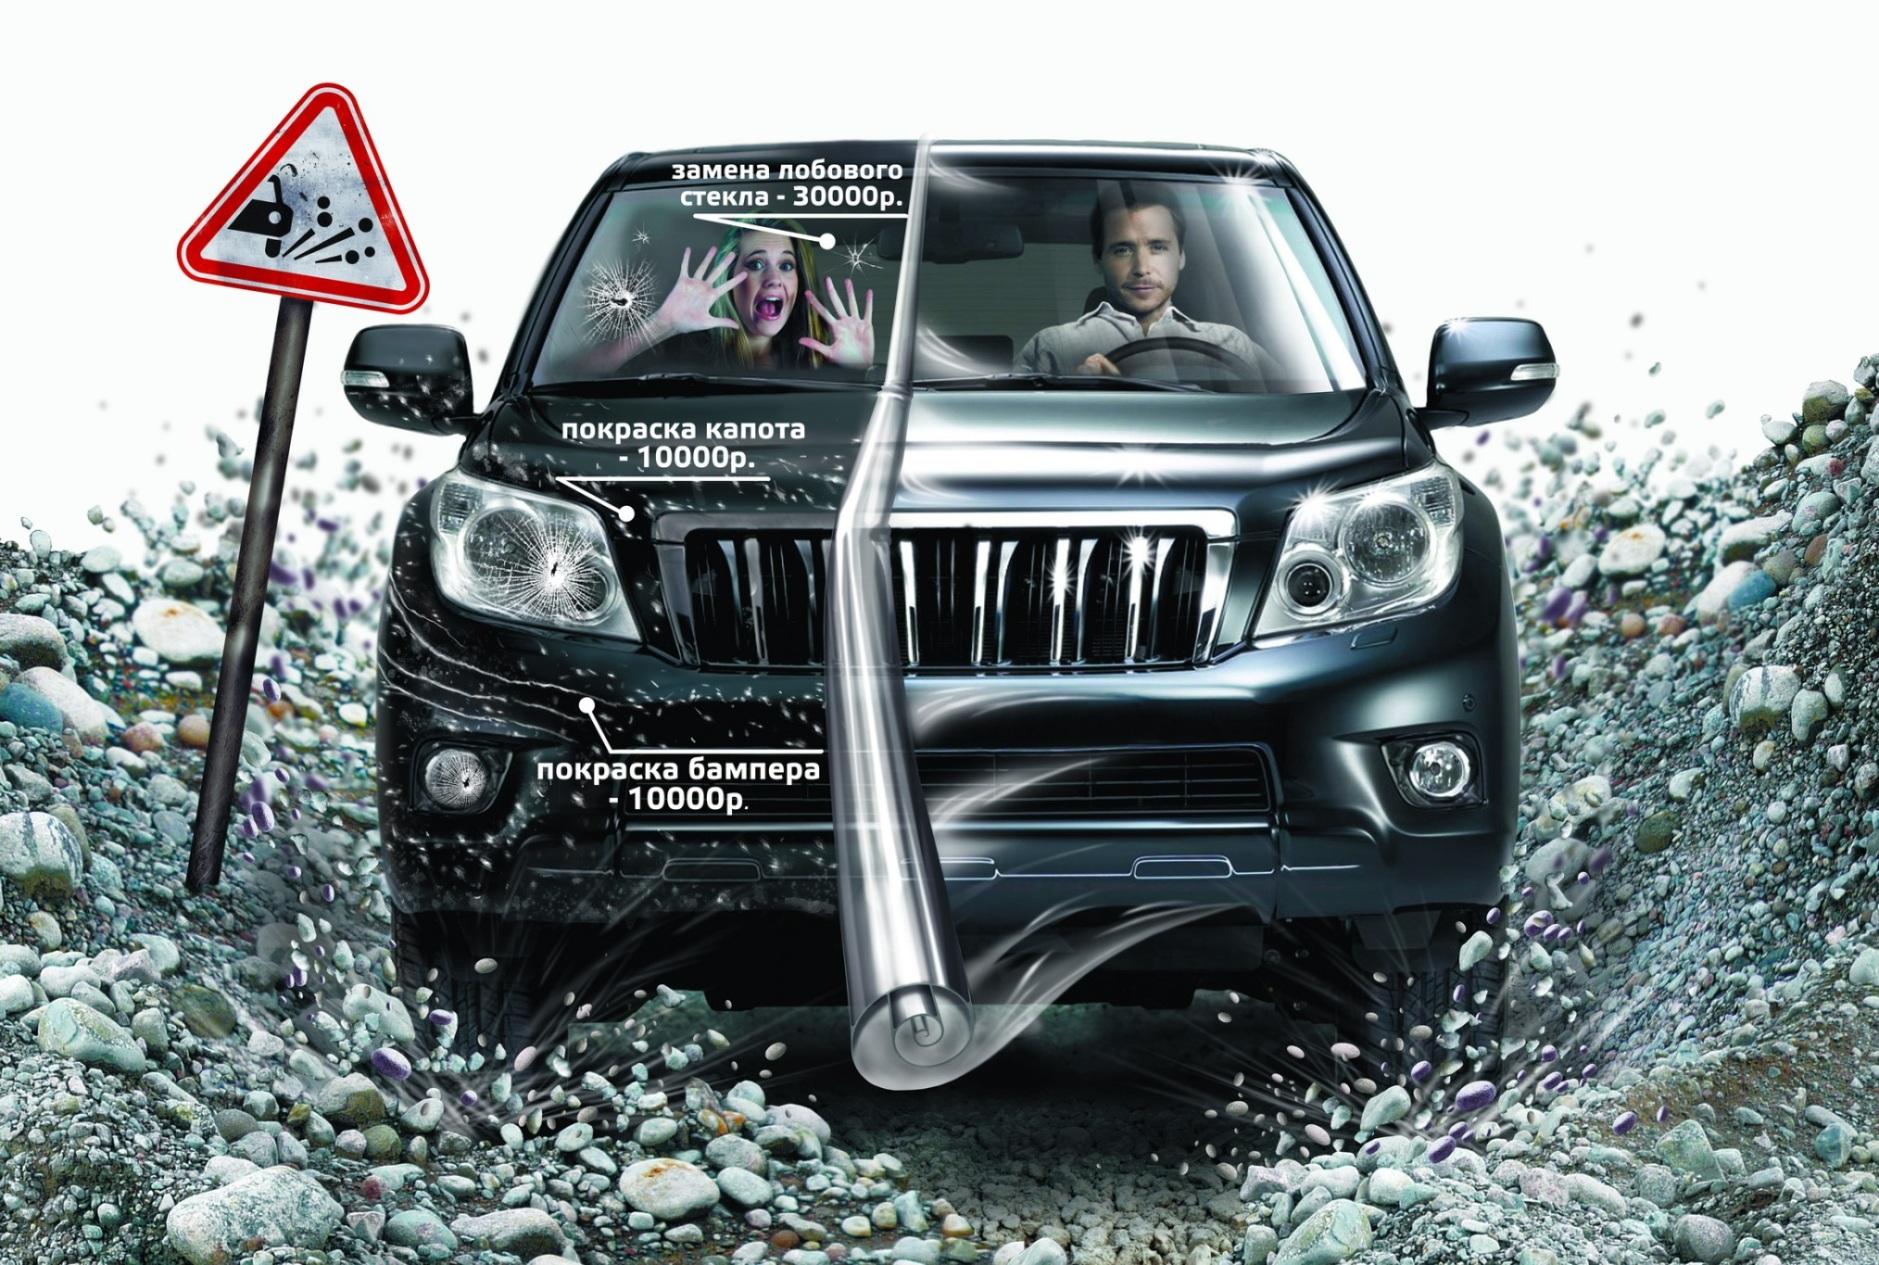 Антигравийная пленка на автомобиль: особенности установки